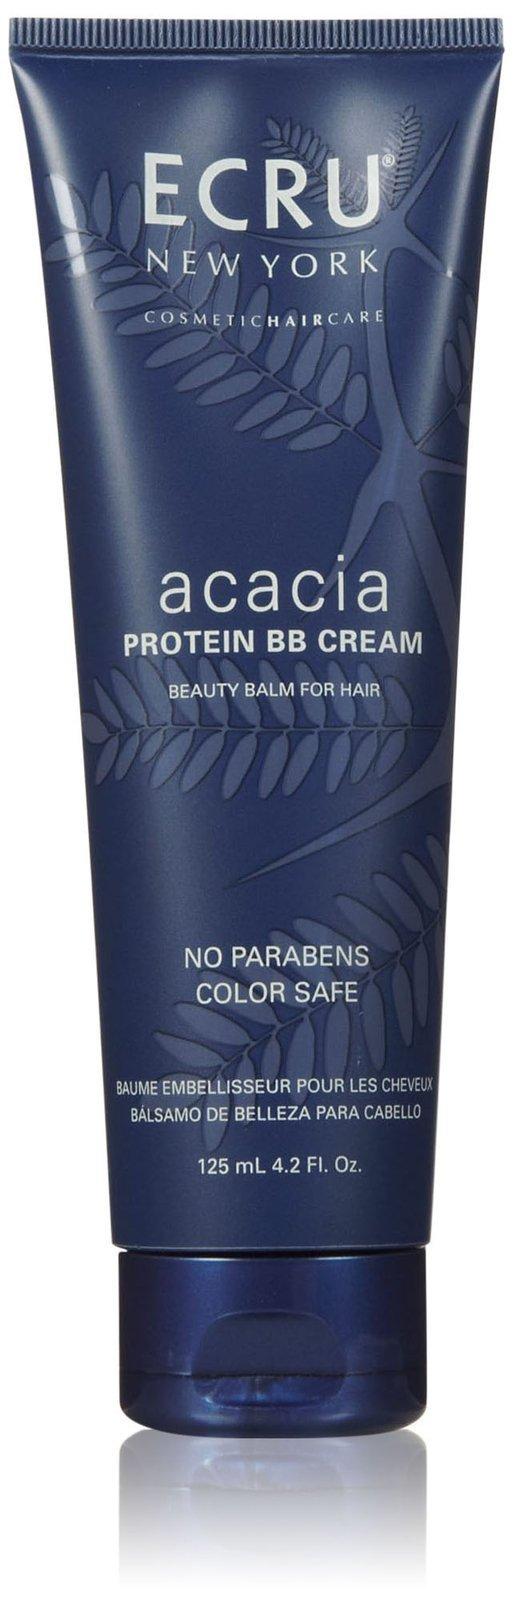 Ecru New York Acacia Protein BB Cream